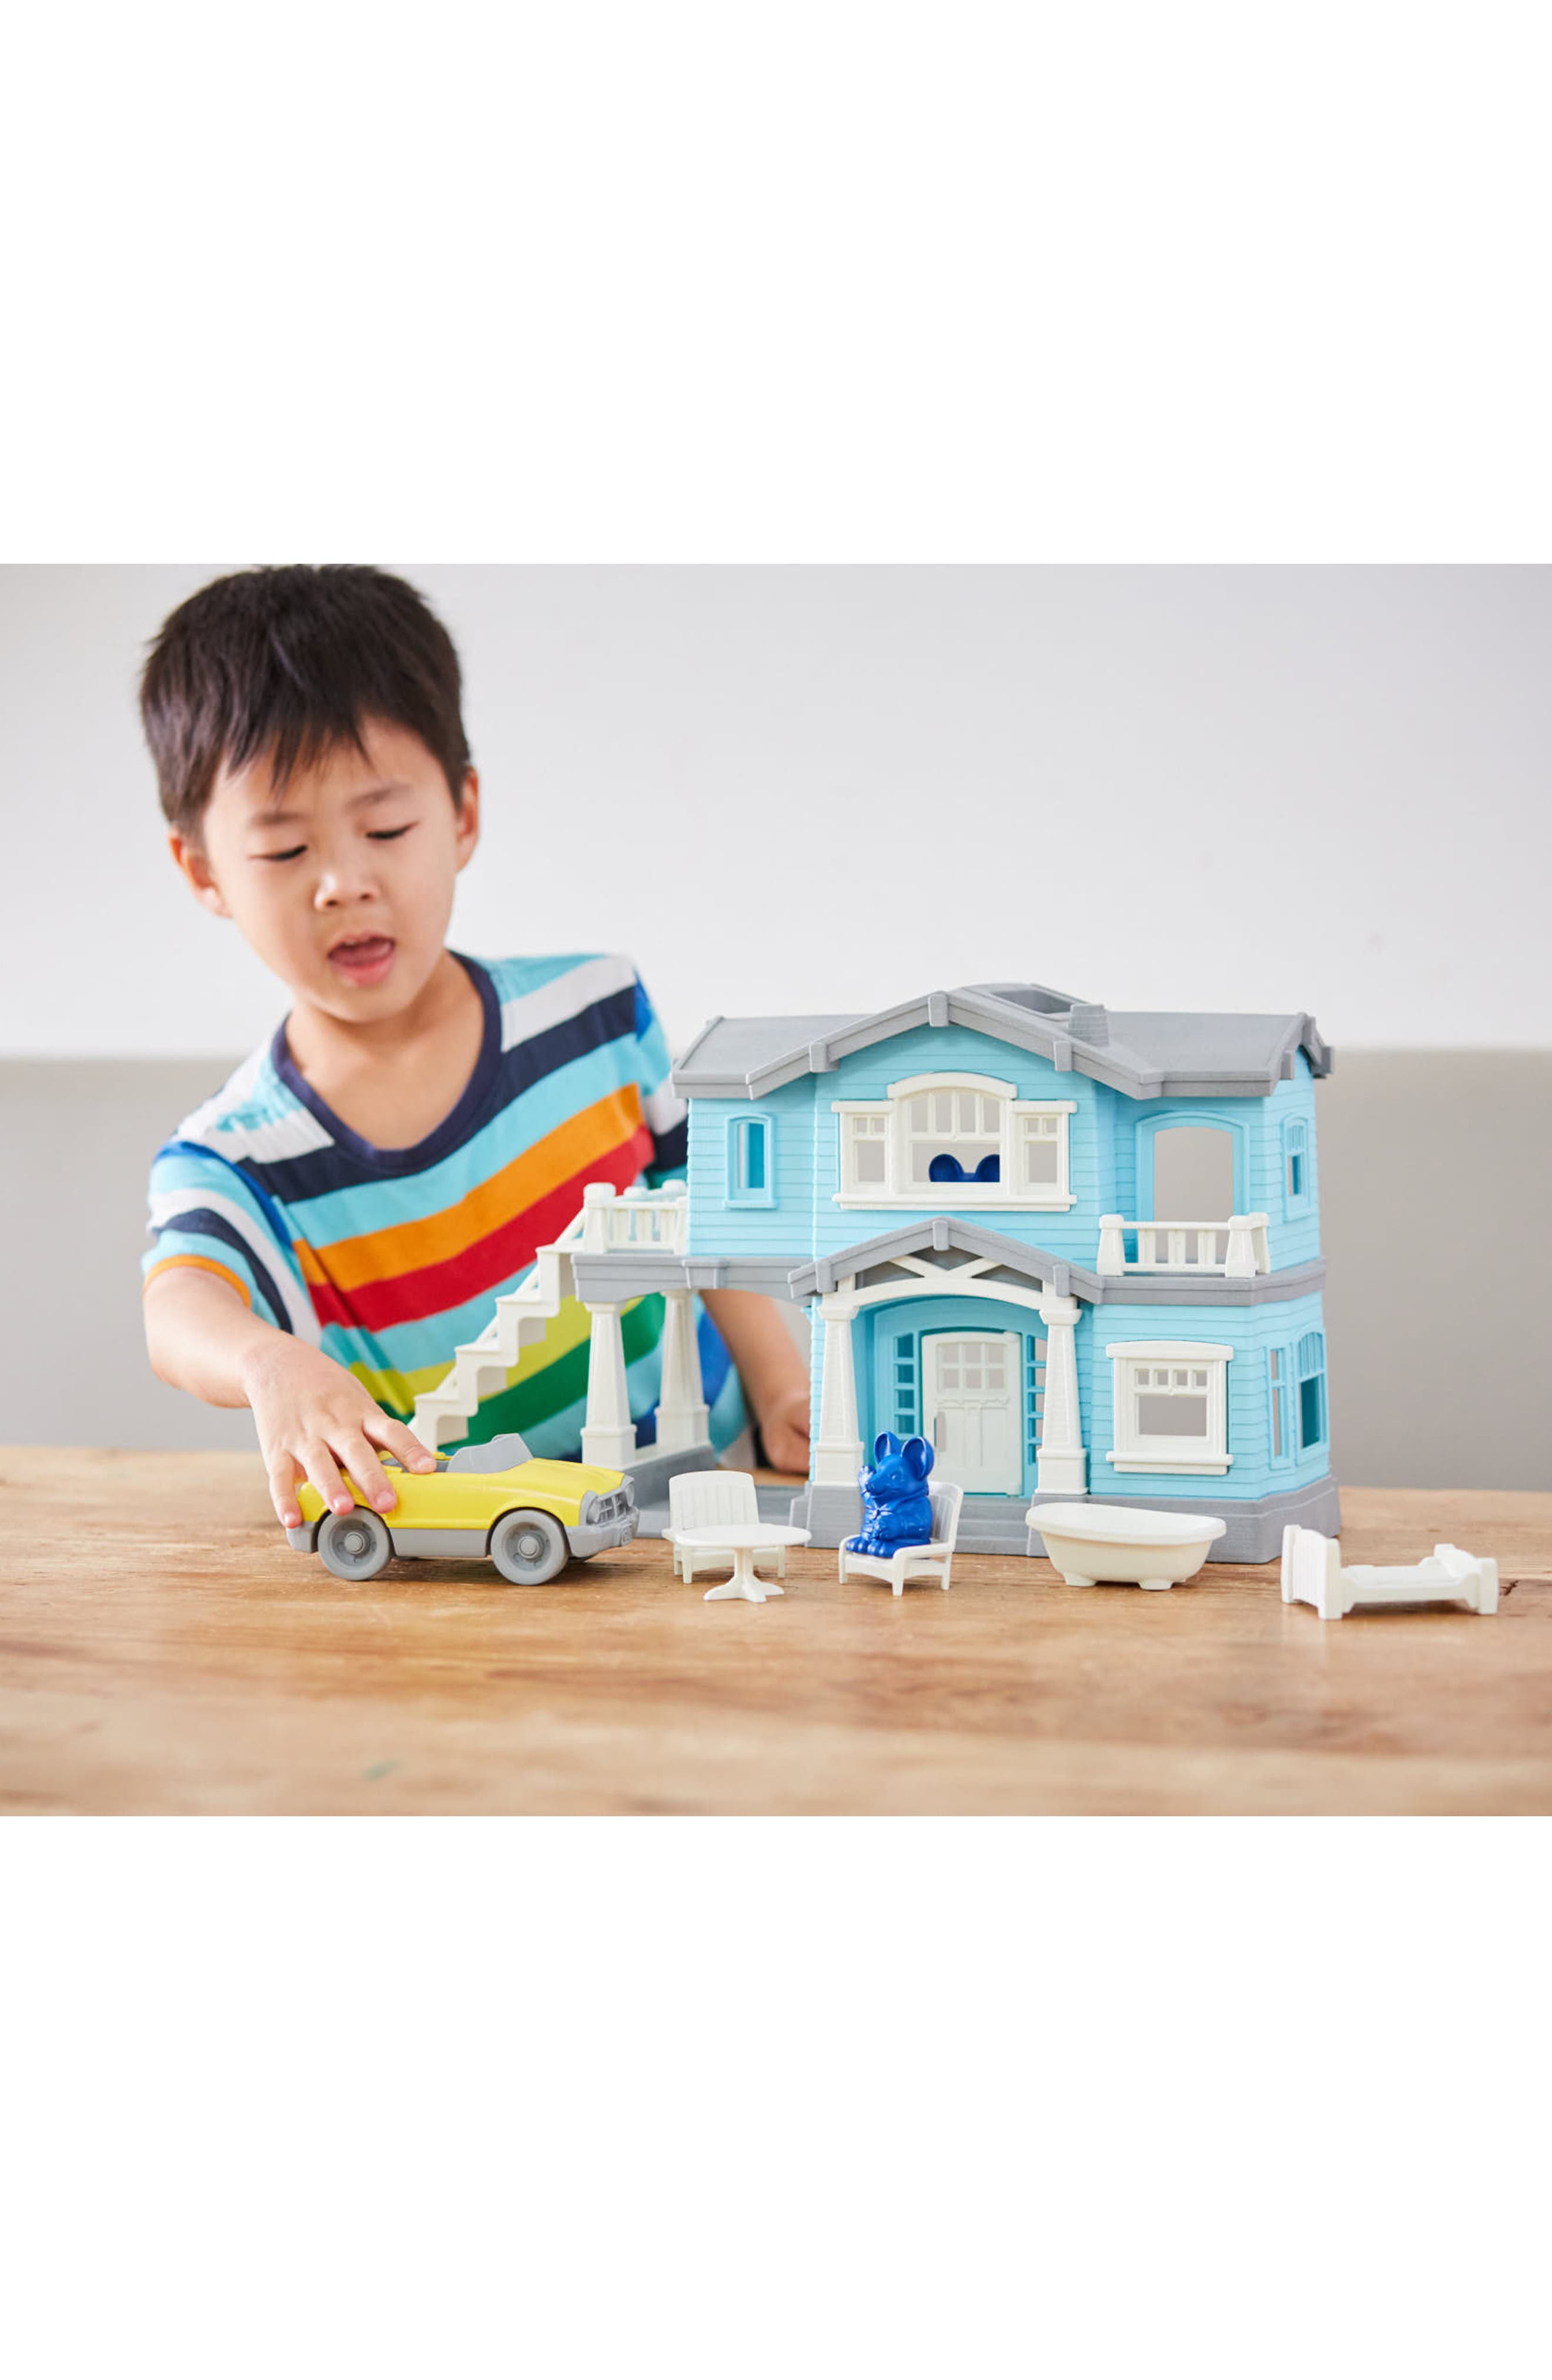 10-Piece House Play Set,                             Alternate thumbnail 5, color,                             450